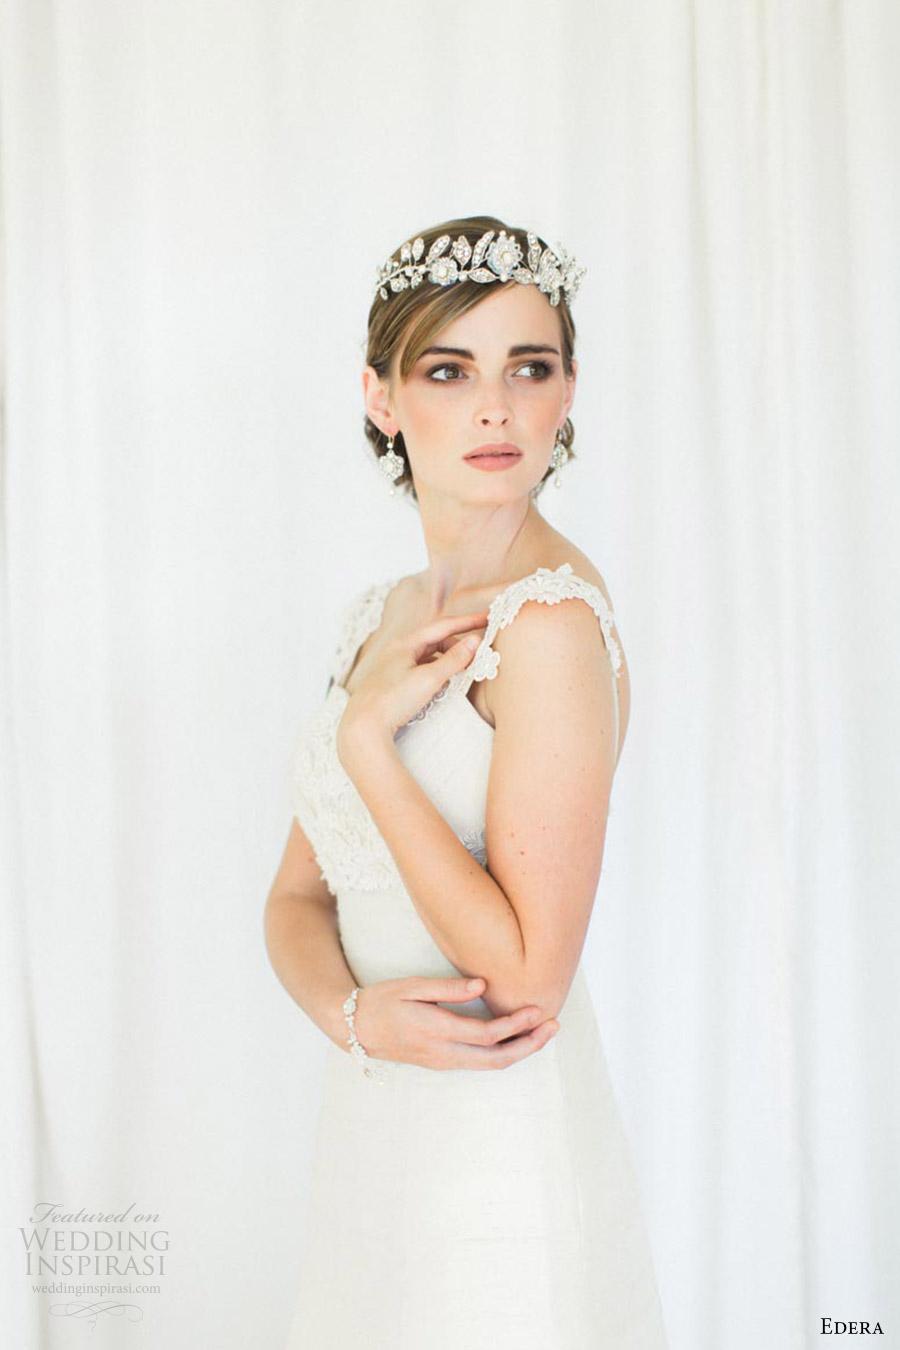 edera jewelry 2016 bridal accessories collection (aquarelle) tiara fv romantic edwardian inspired bride